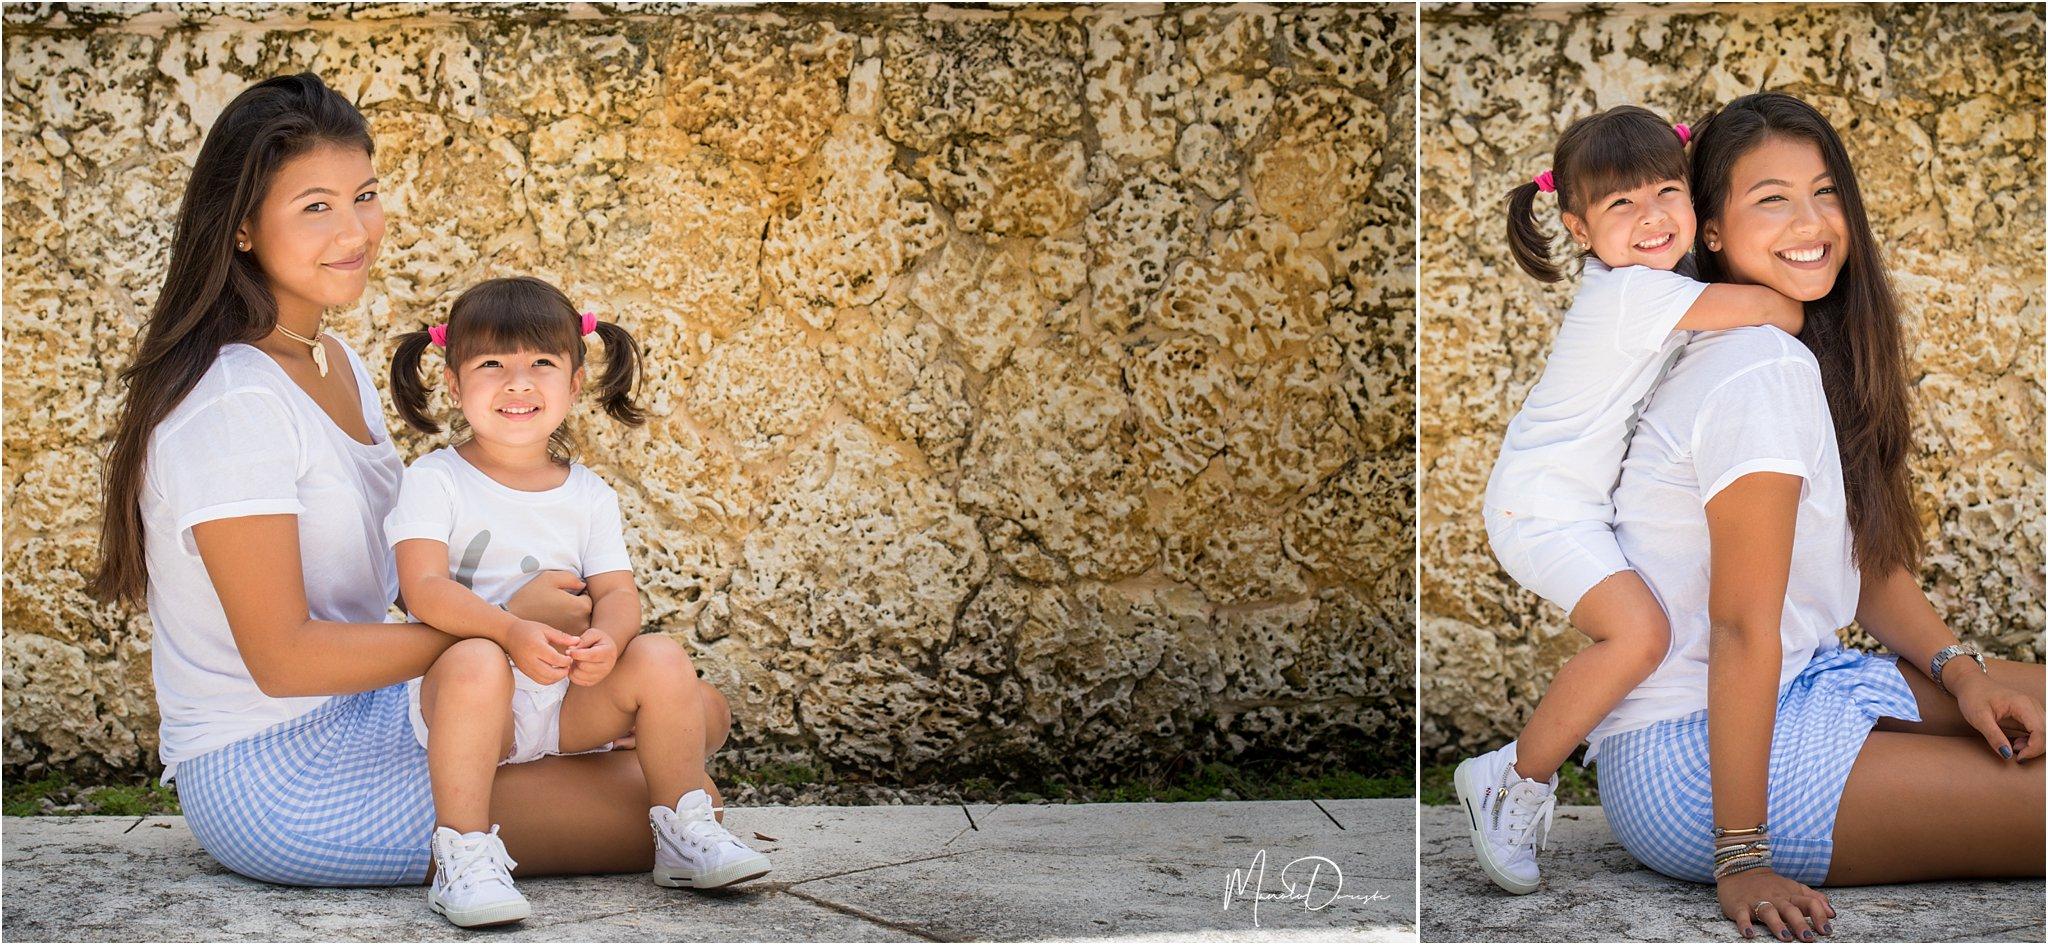 0236_ManoloDoreste_InFocusStudios_Wedding_Family_Photography_Miami_MiamiPhotographer.jpg